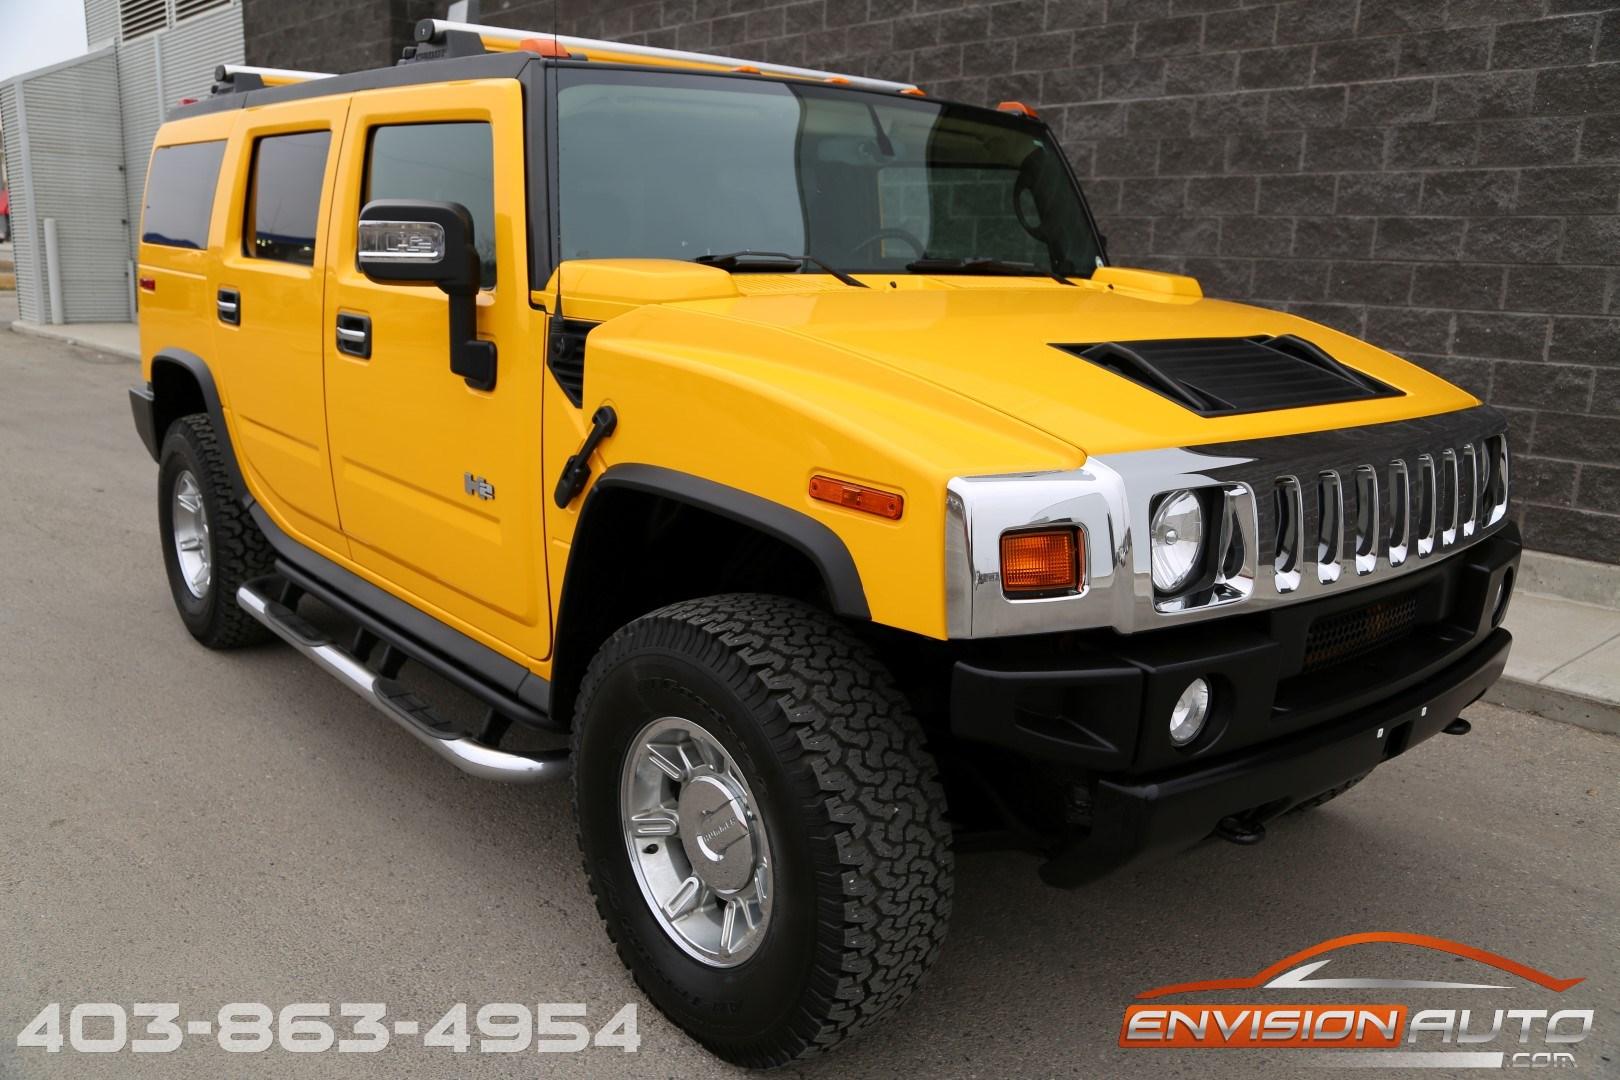 2005 H2 Hummer SUV Luxury Pkg – LOW MILEAGE Envision Auto